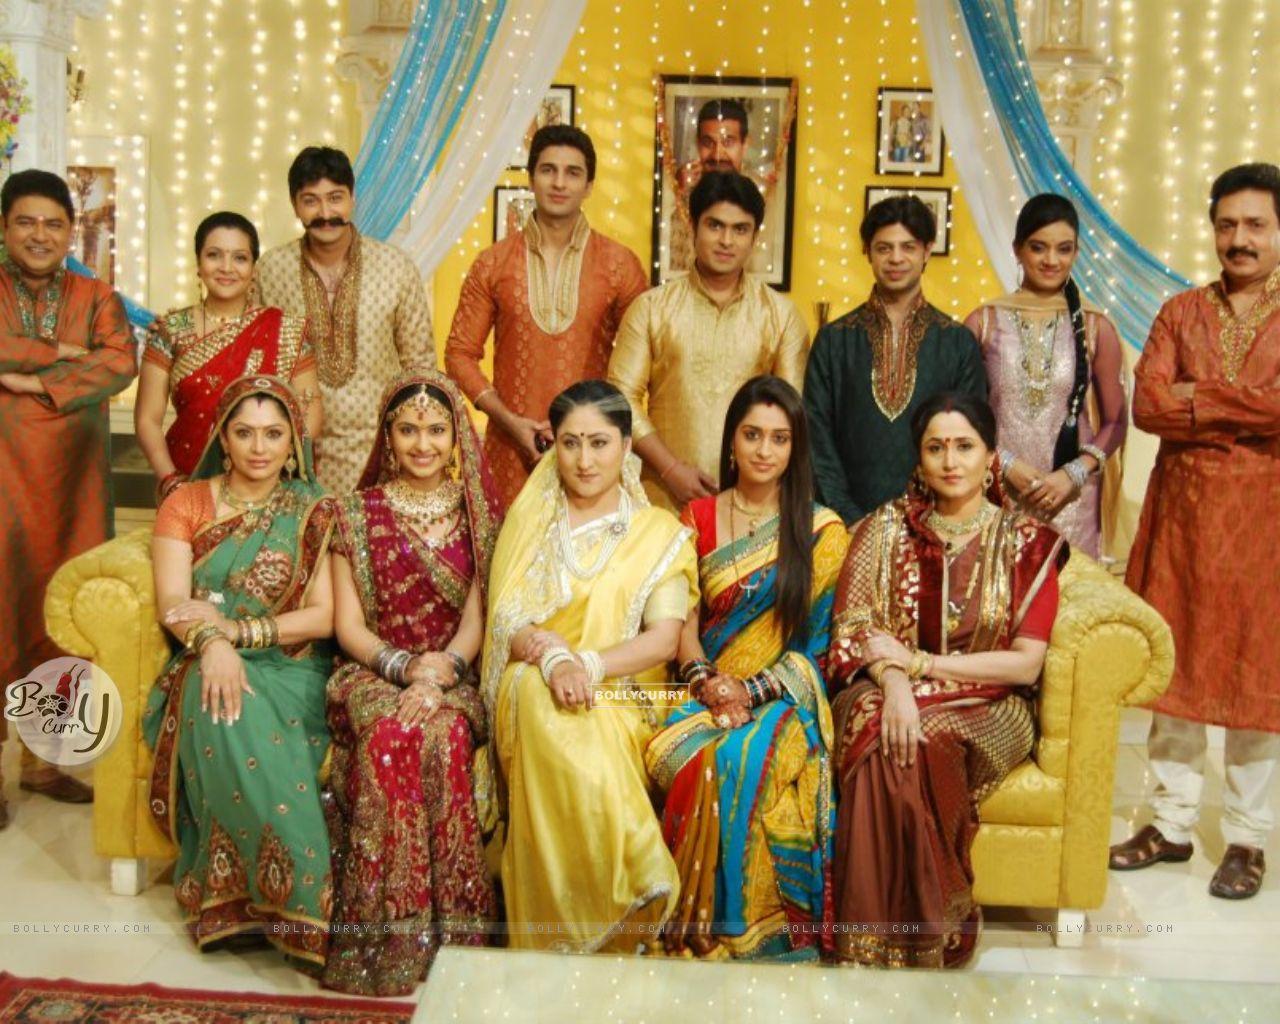 Nishigandha Wad Family